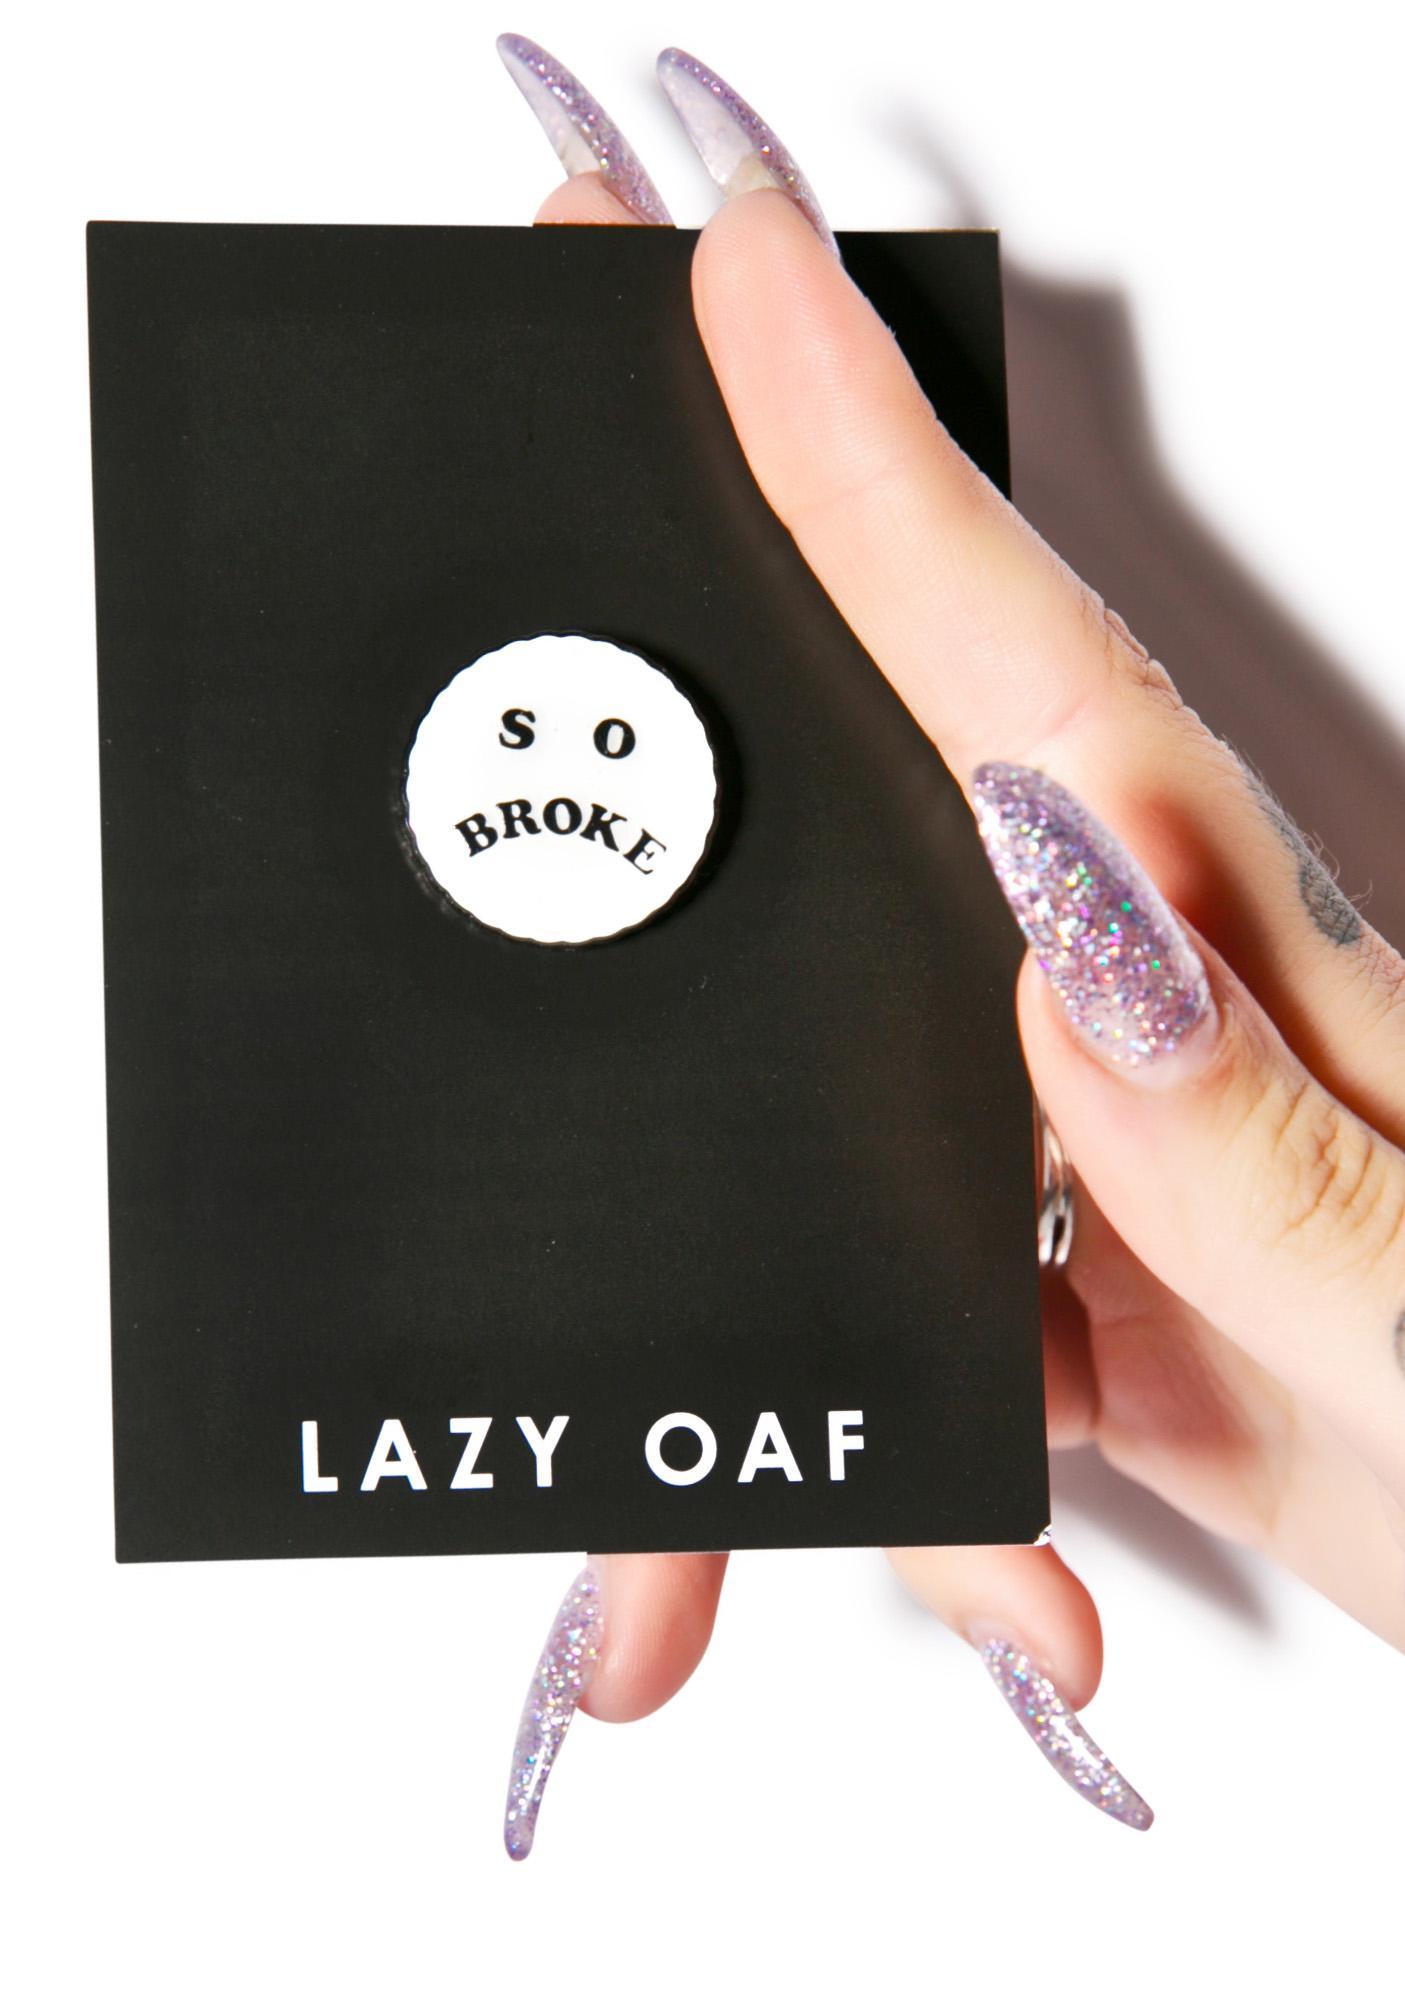 Lazy Oaf So Broke Pin Badge